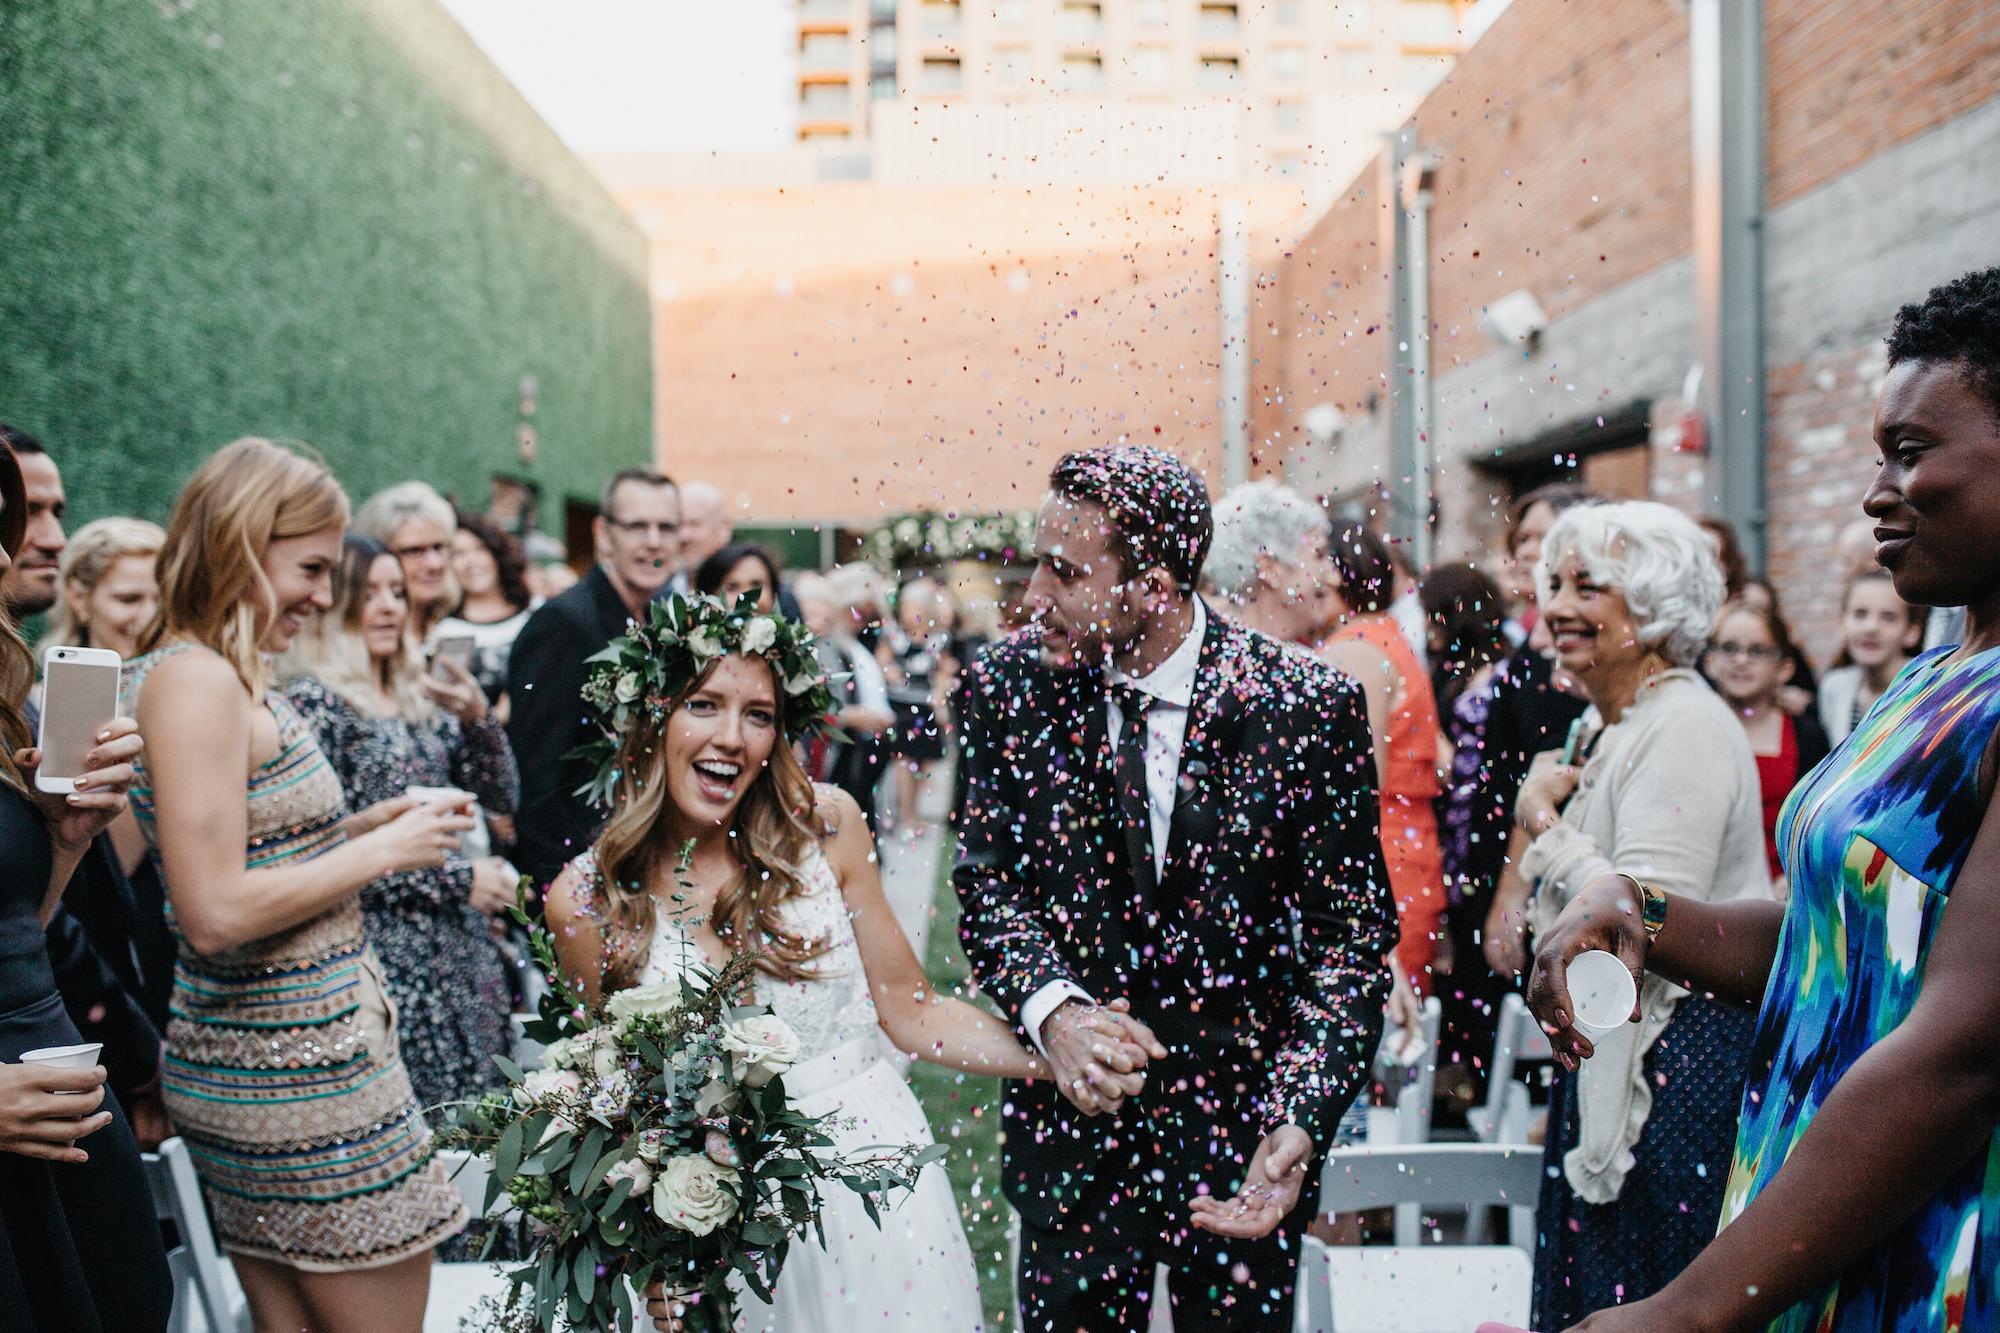 arizona - wedding - photographer 433.jpg